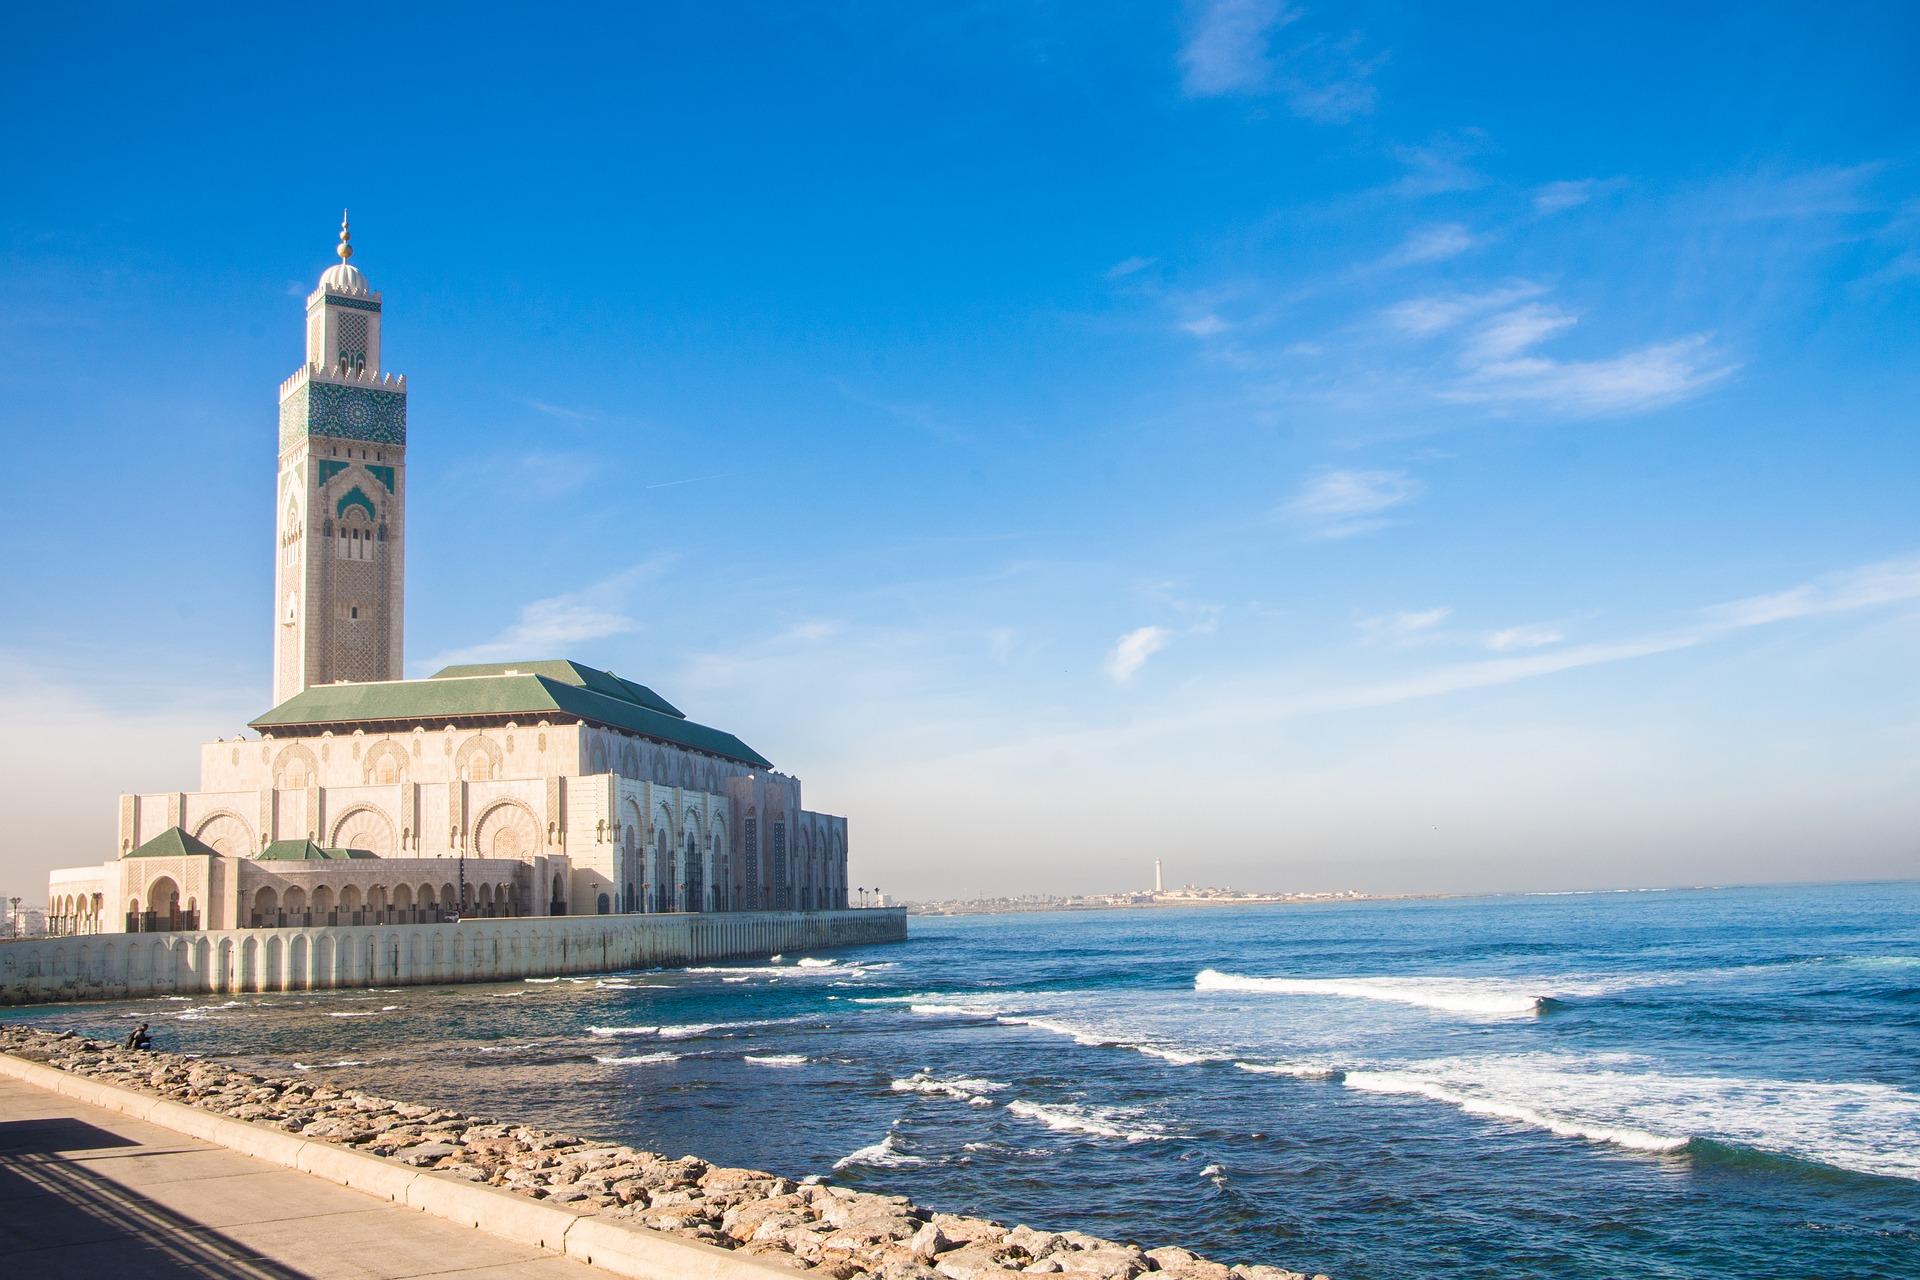 Casablanca Urlaub dein Marokko Deal ab 269,07€ - Nordafrikas Metropole